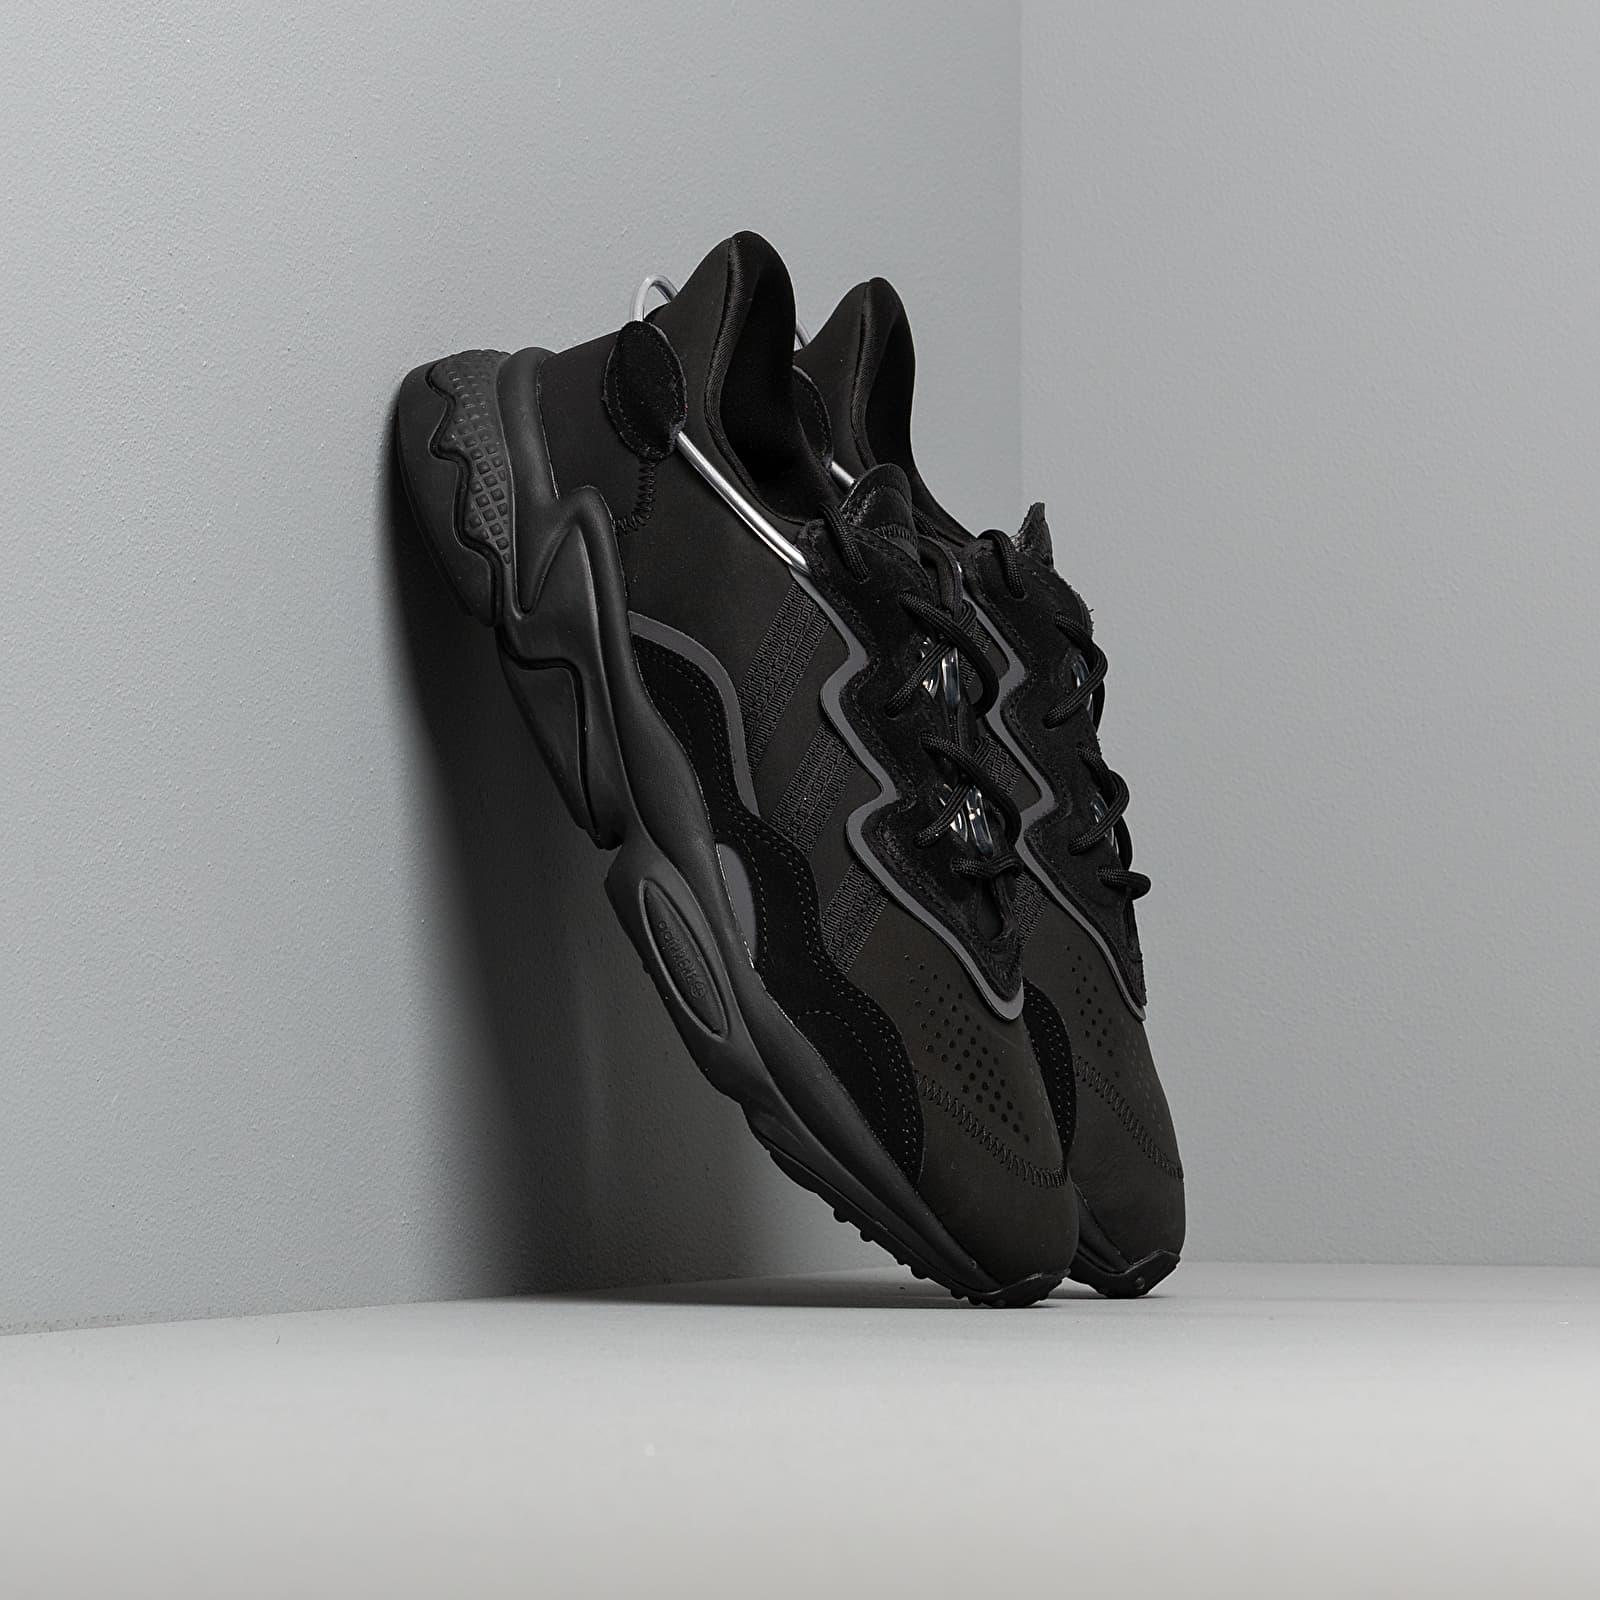 Buty męskie adidas Ozweego Core Black/ Core Black/ Night Metalic